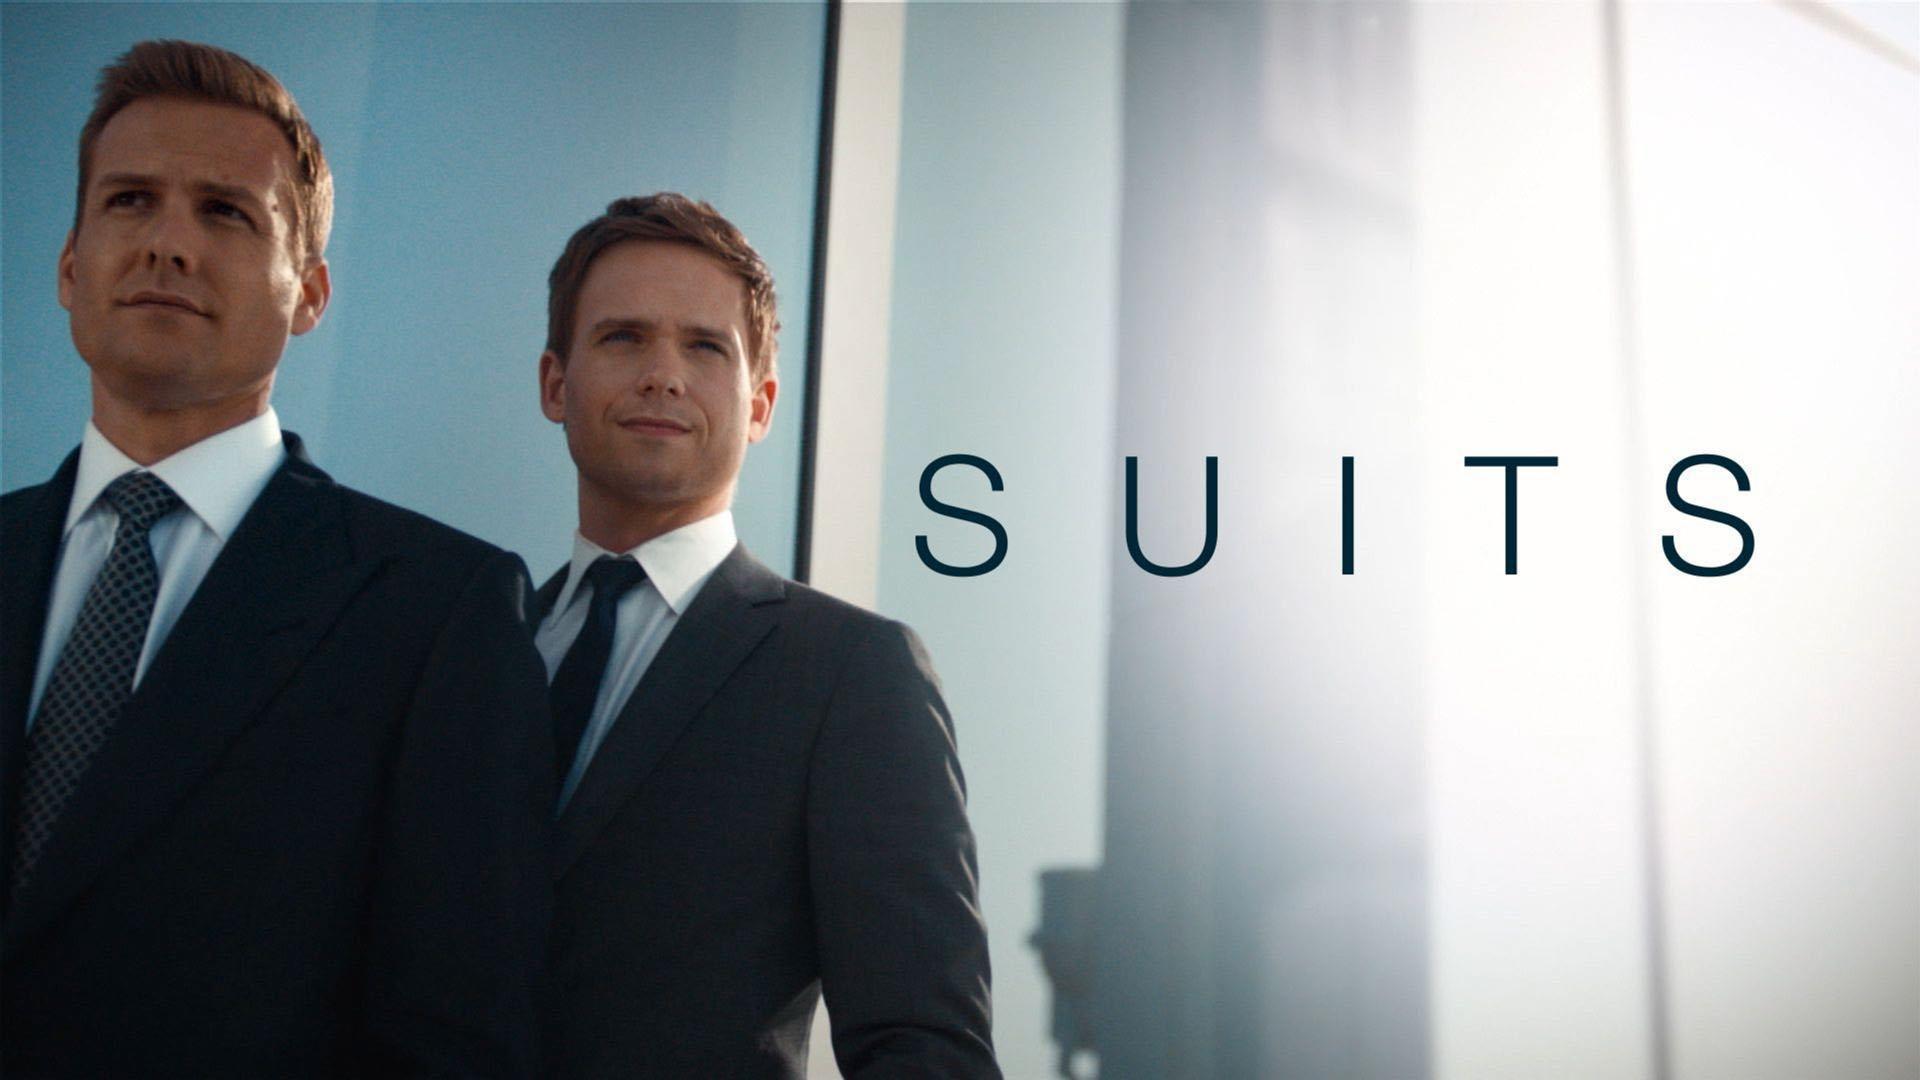 Suits wallpaper 5